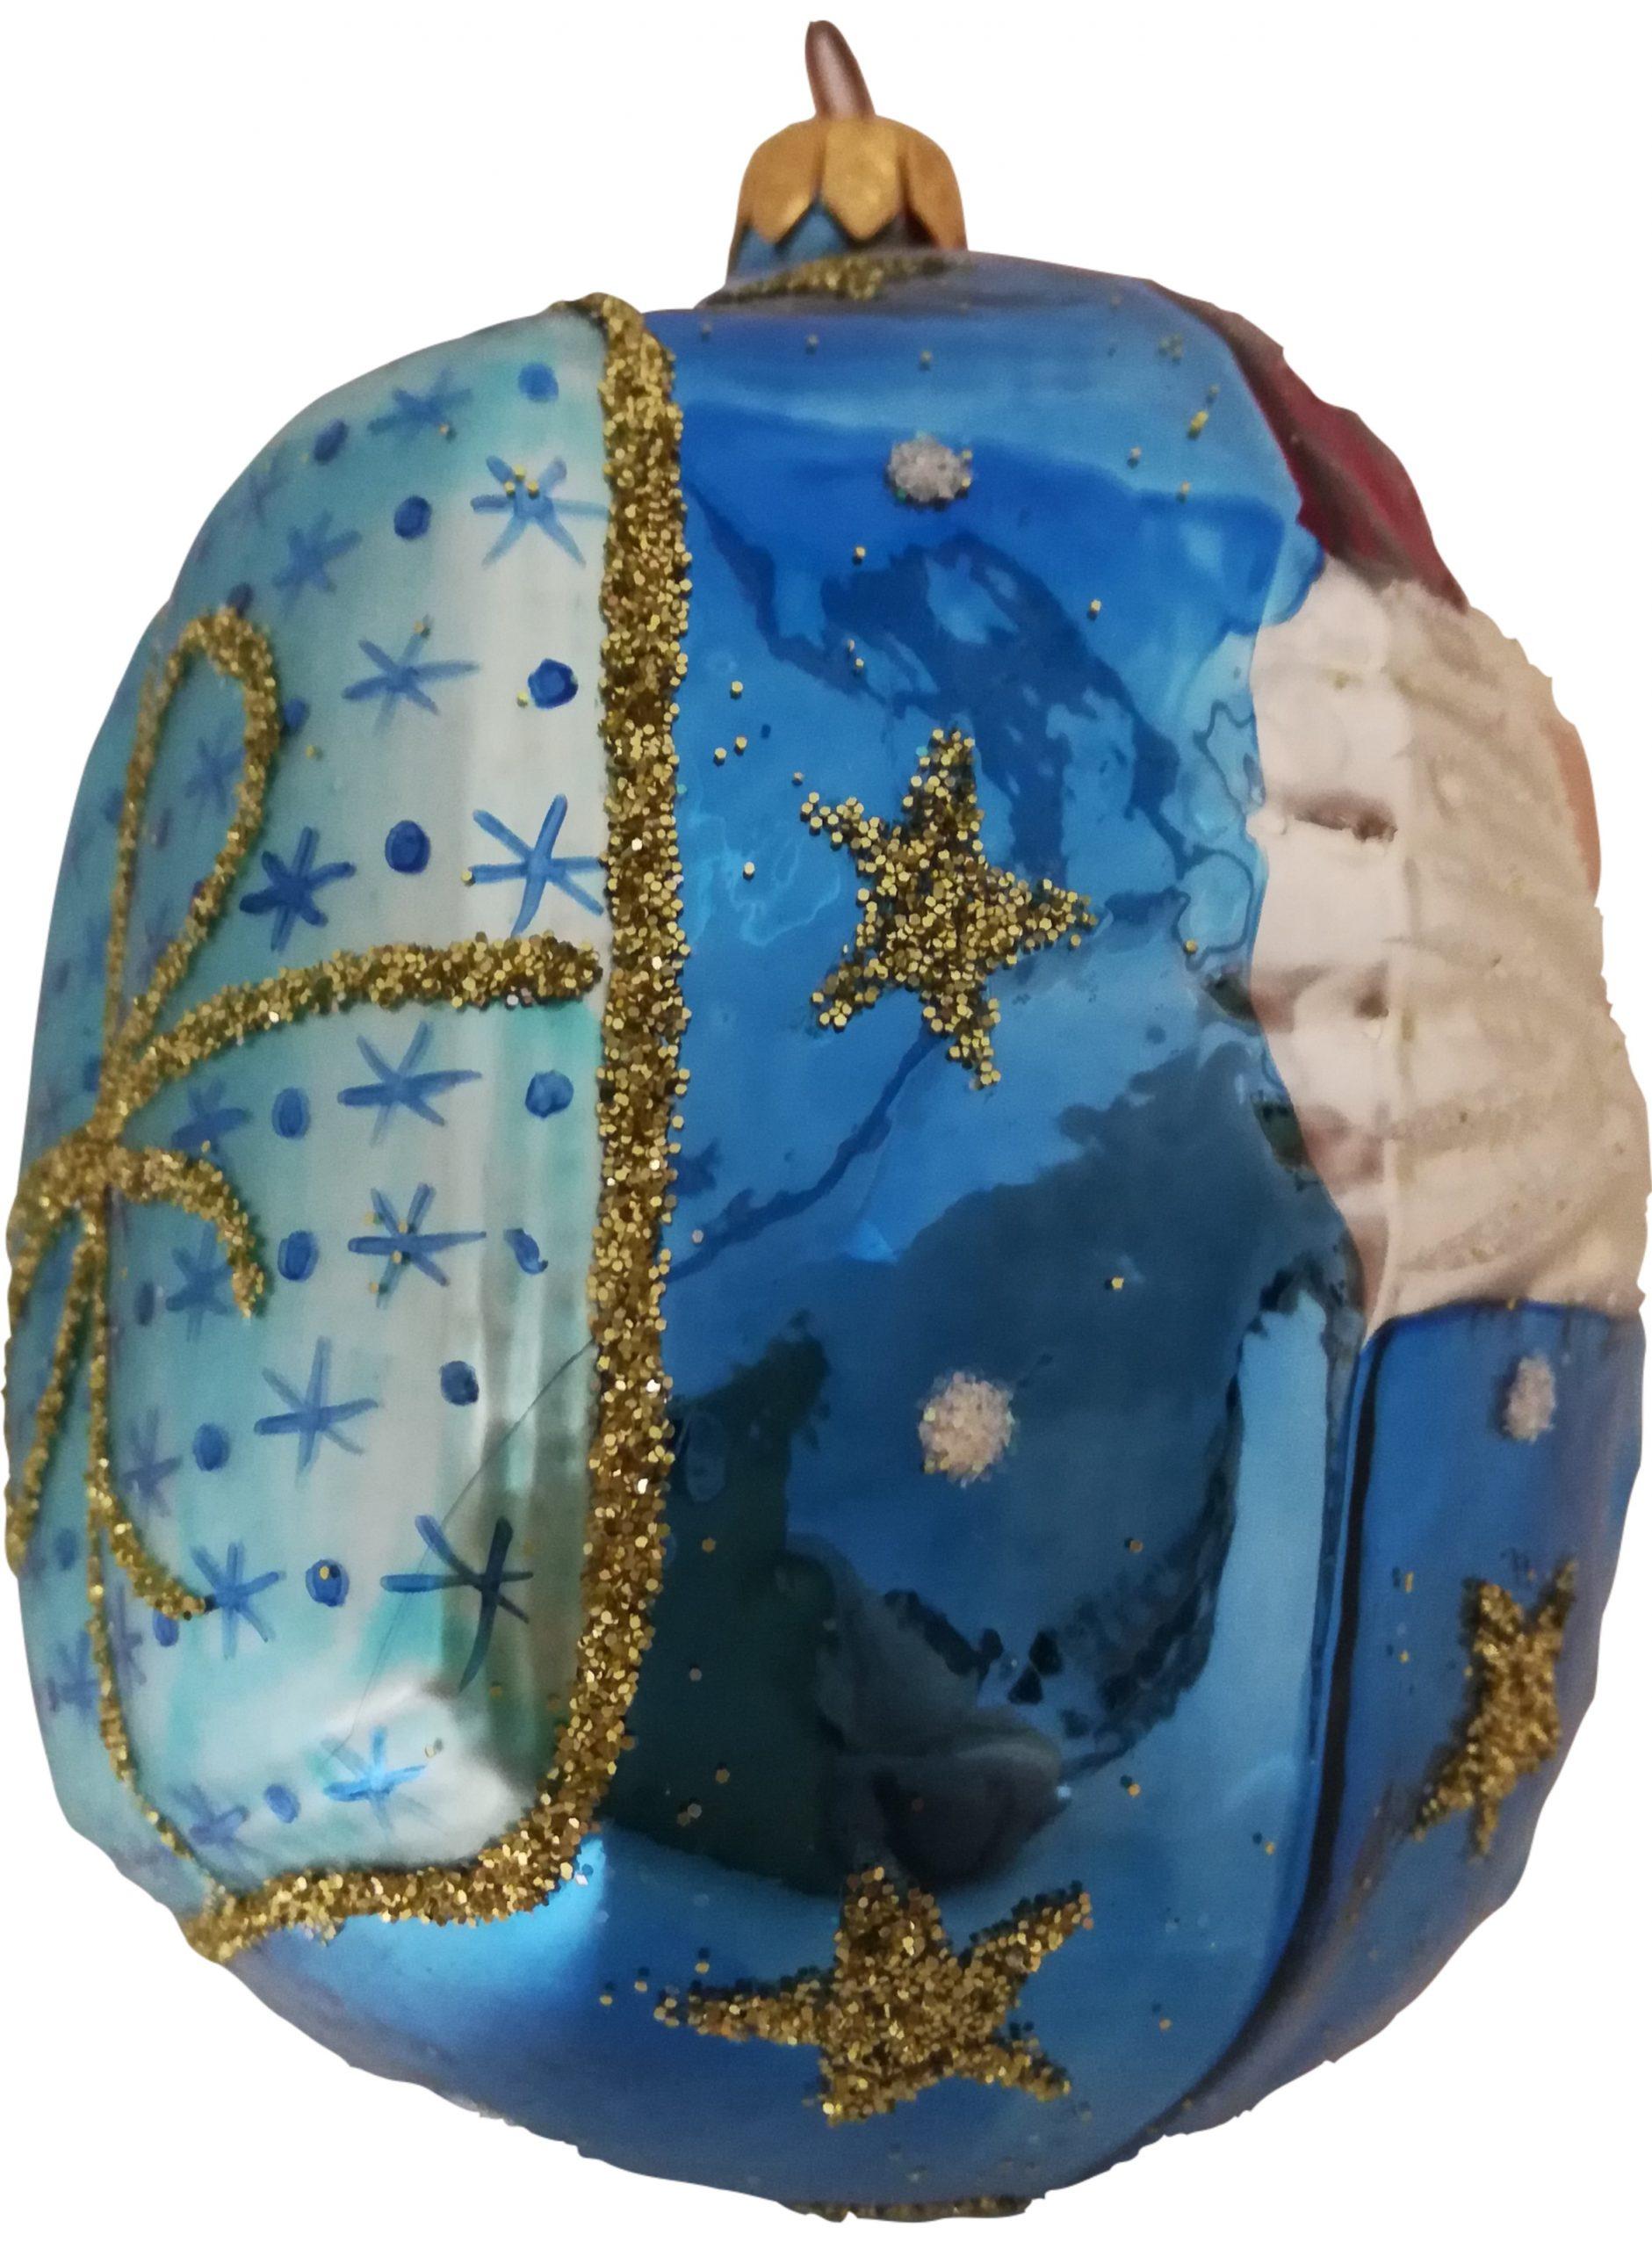 Santa head glass ornament - side view